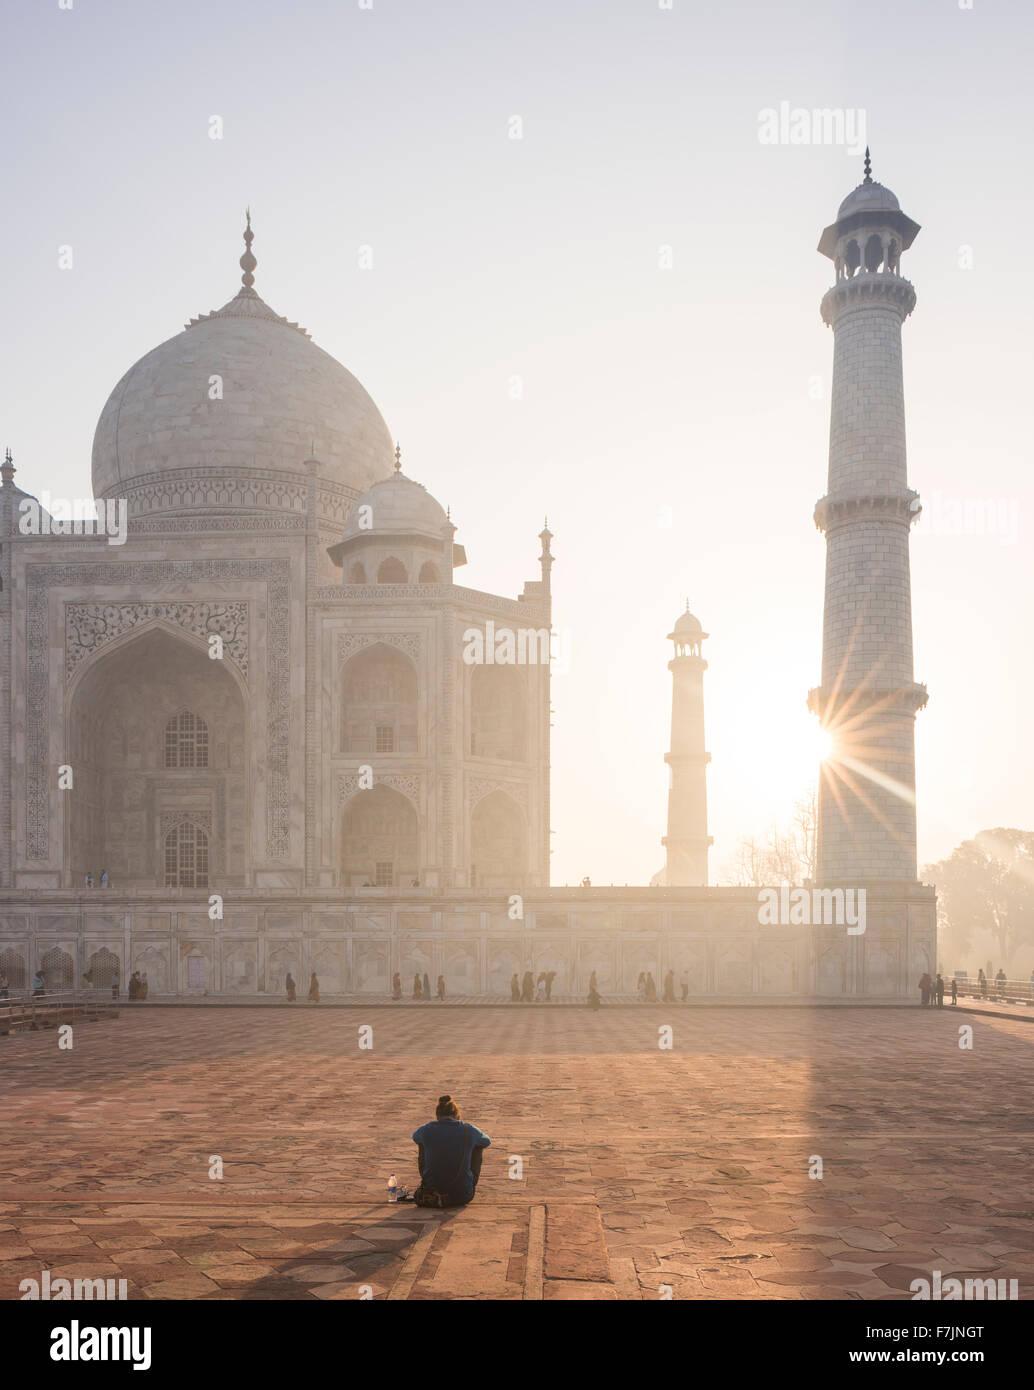 man watching Dawn at The Taj Mahal, Agra, Uttar Pradesh, India - Stock Image